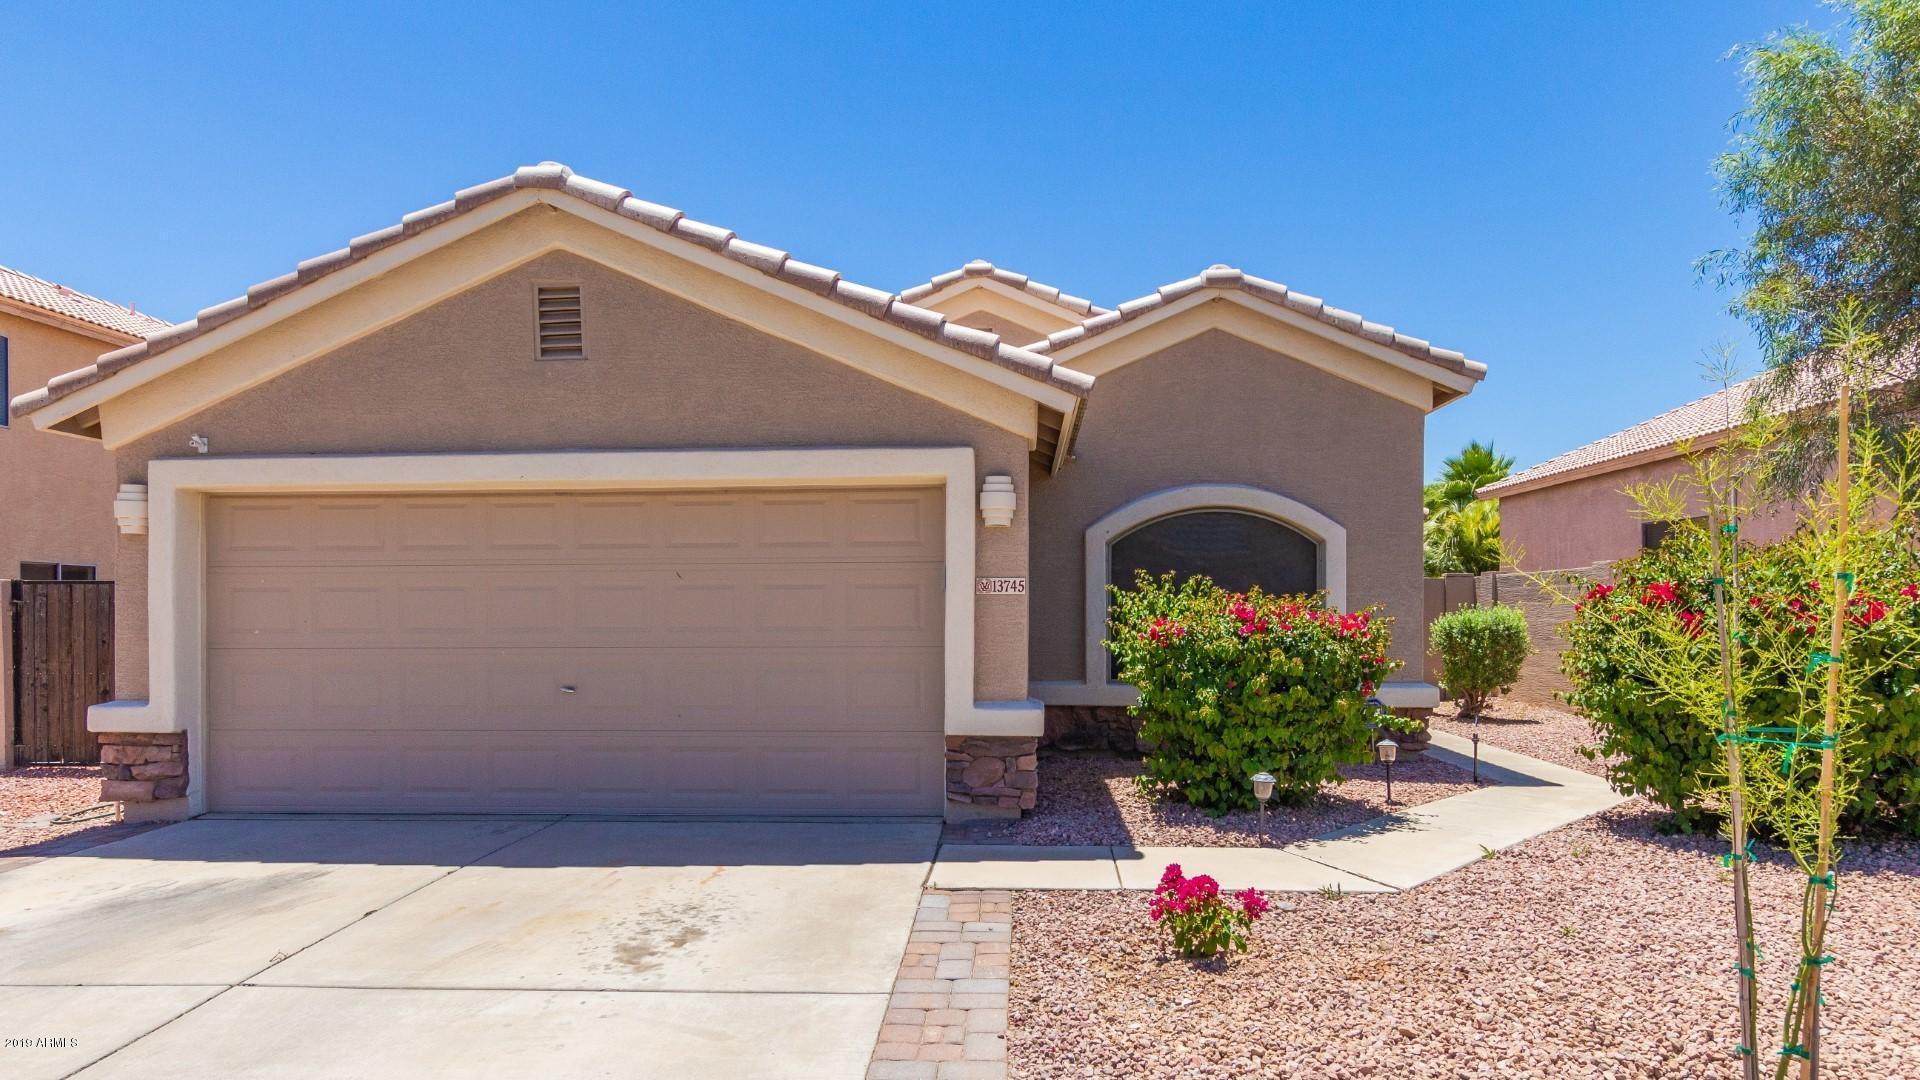 Photo of 13745 W SOLANO Drive, Litchfield Park, AZ 85340